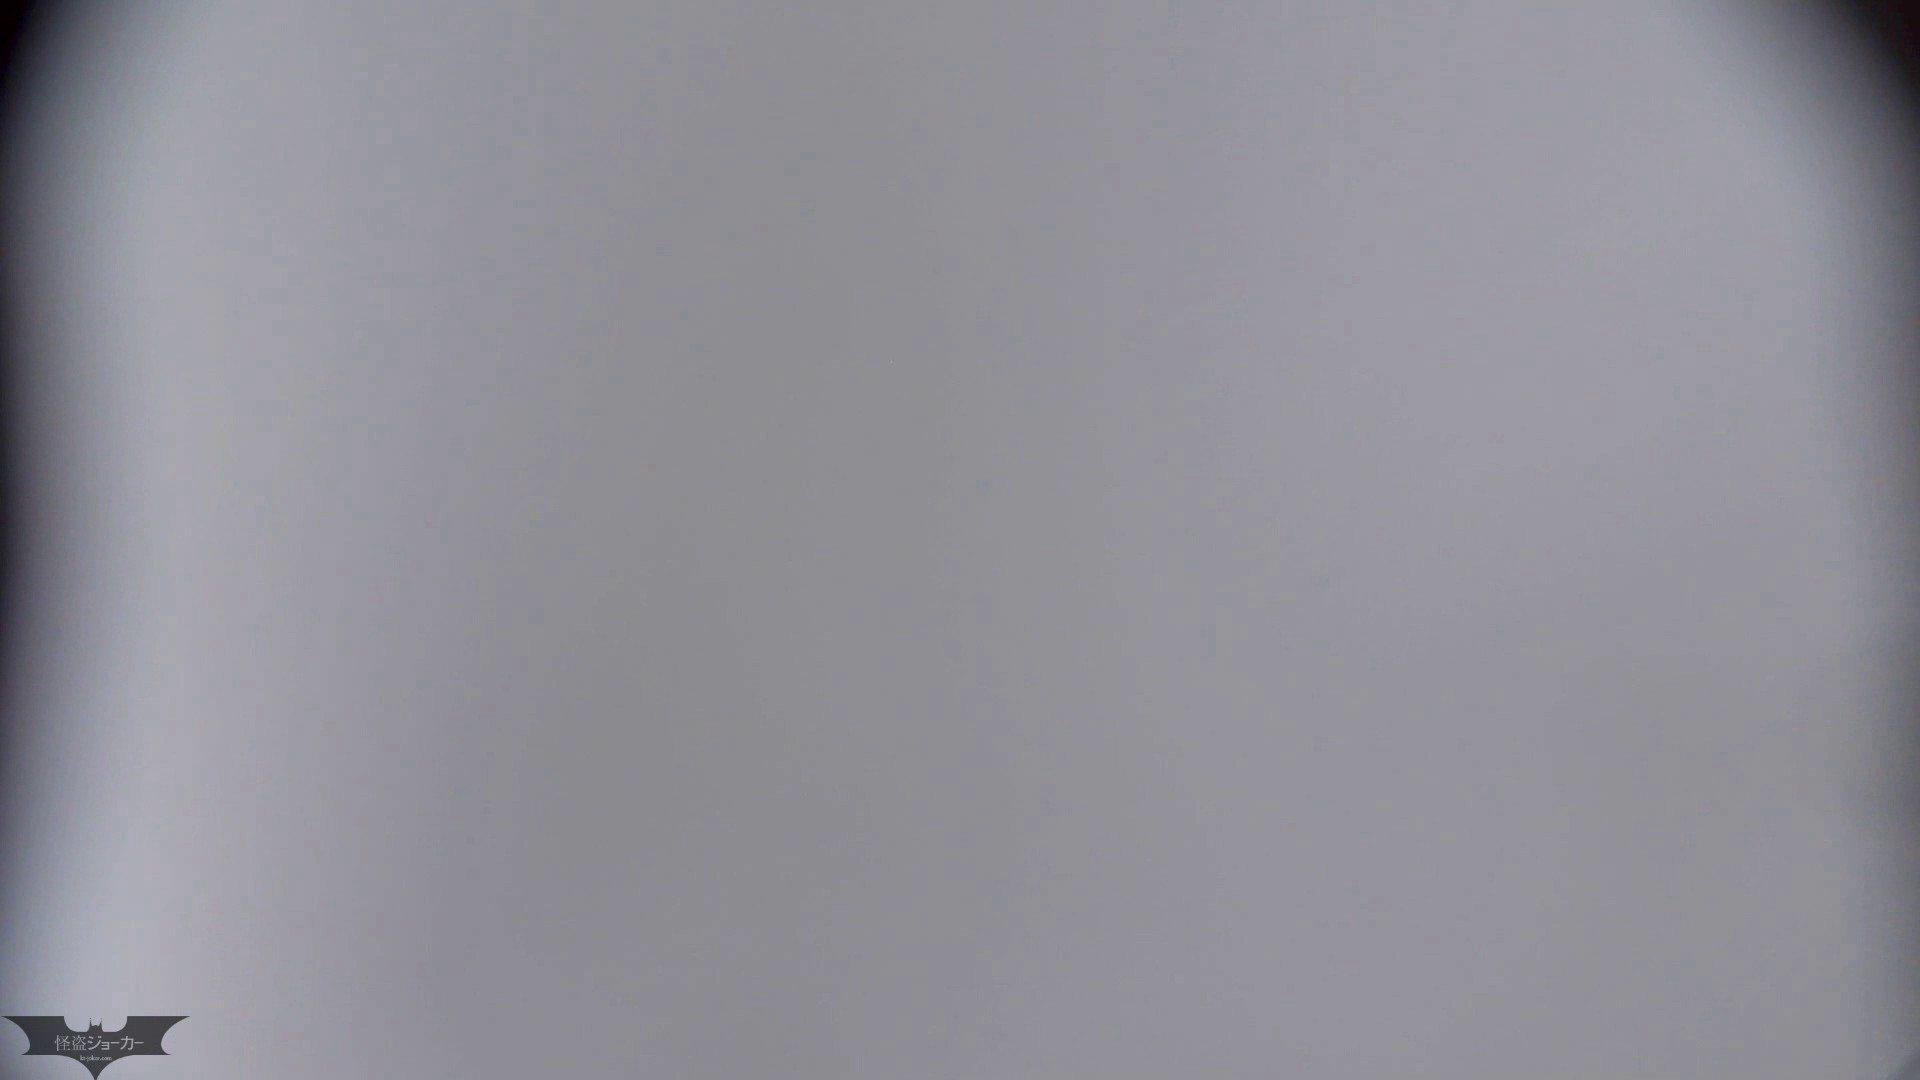 vol.62 来ました。最高作の予感!美しいすぎるハーフ 洗面所  109pic 105